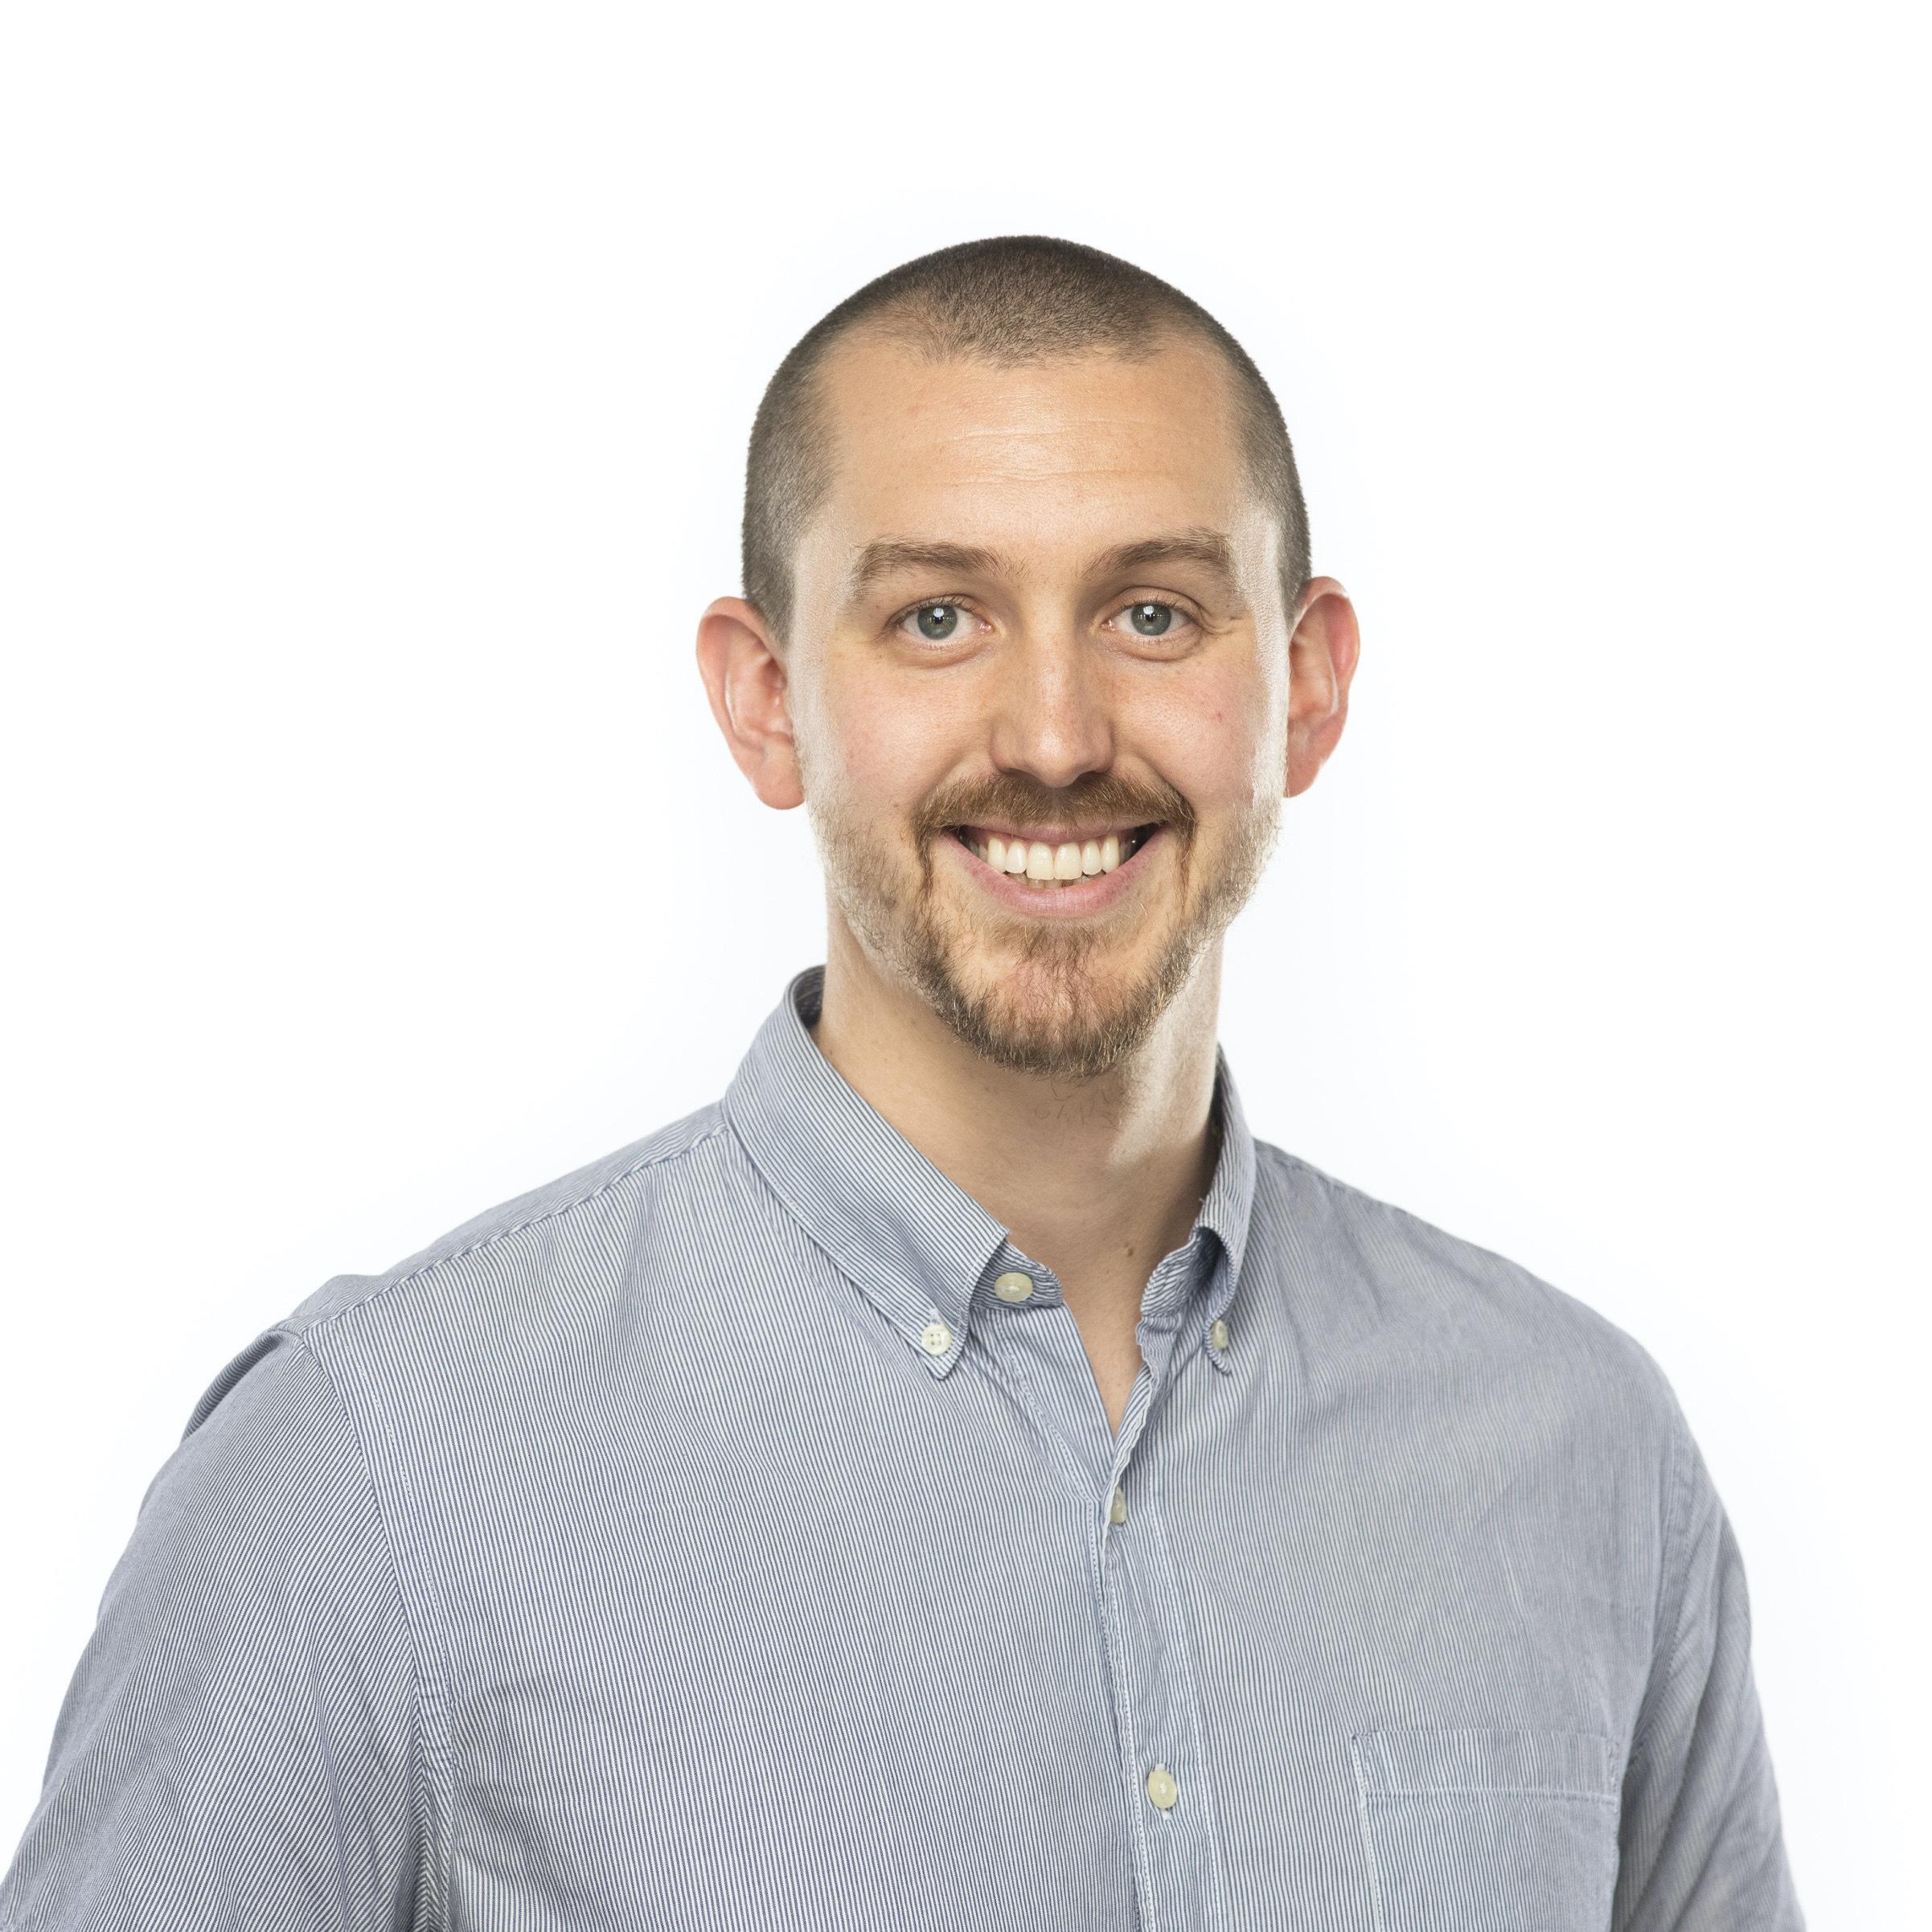 Portrait of Jordan Mickens